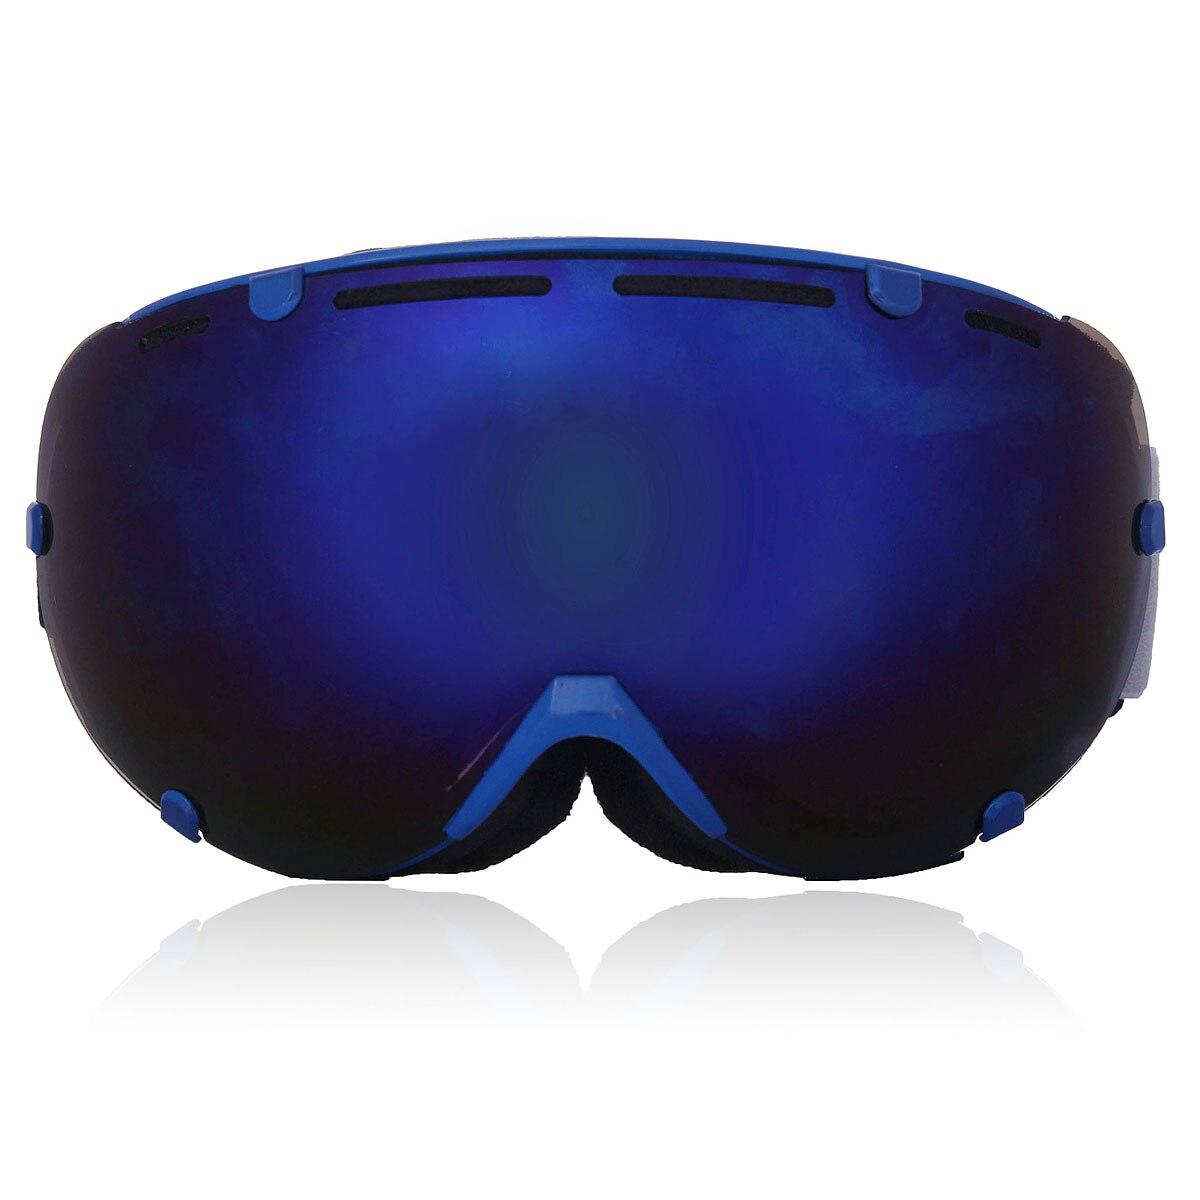 4 Colores Profesional Adulto Unisex <font><b>Snowboard</b></font> Gafas de Esquí UV Antivaho Gafas de Esquí de Doble Lente De Vidrio